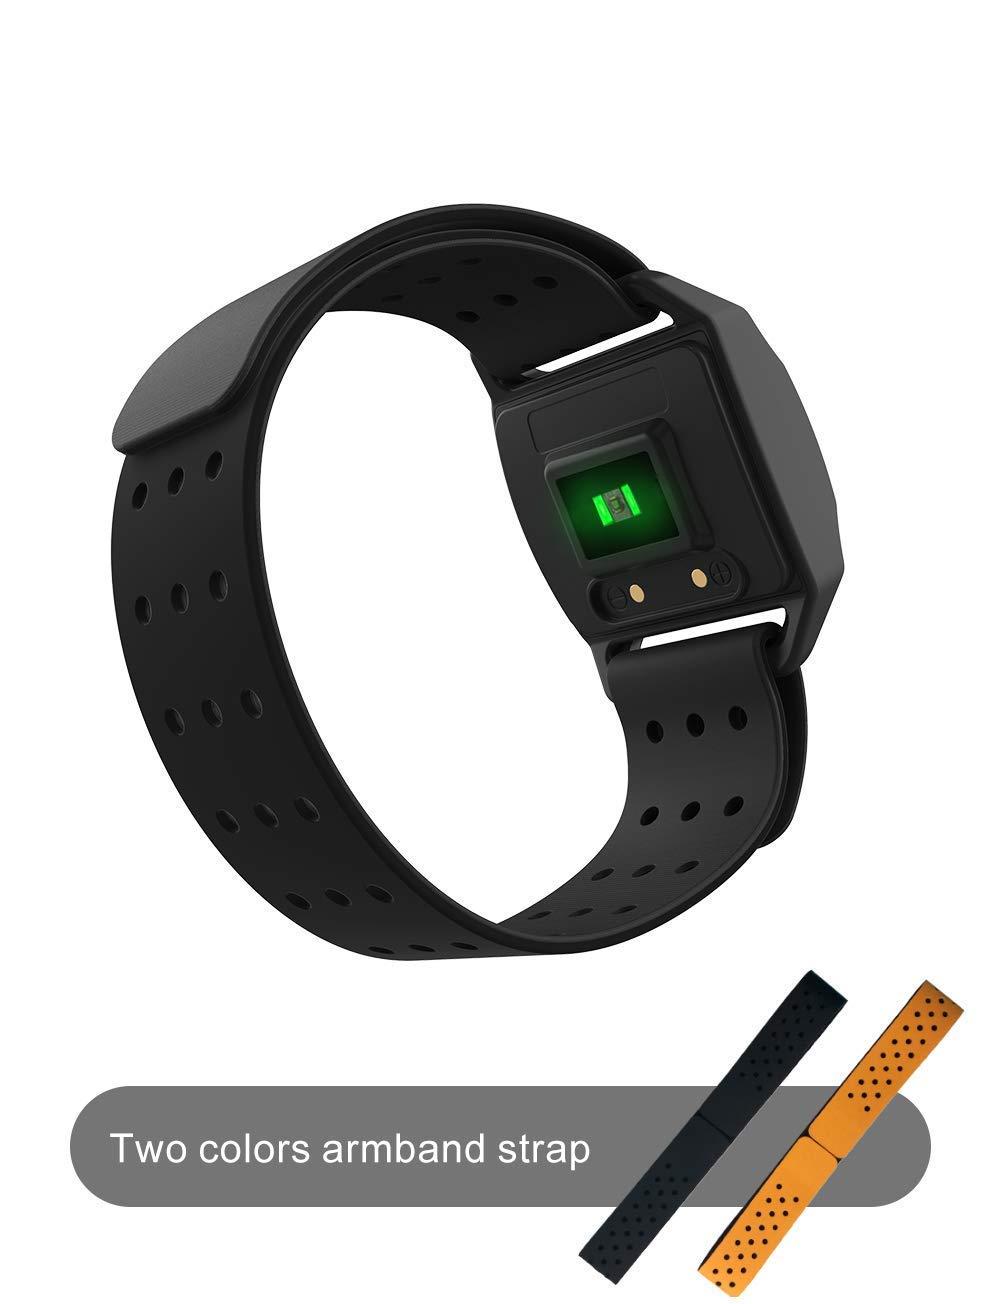 Coospo Heart Rate Armband Sensor Bluetooth Ant Waterproof 38cm Armband 1 15ft Or 1 25ft 35cm Heart Rate Monitors